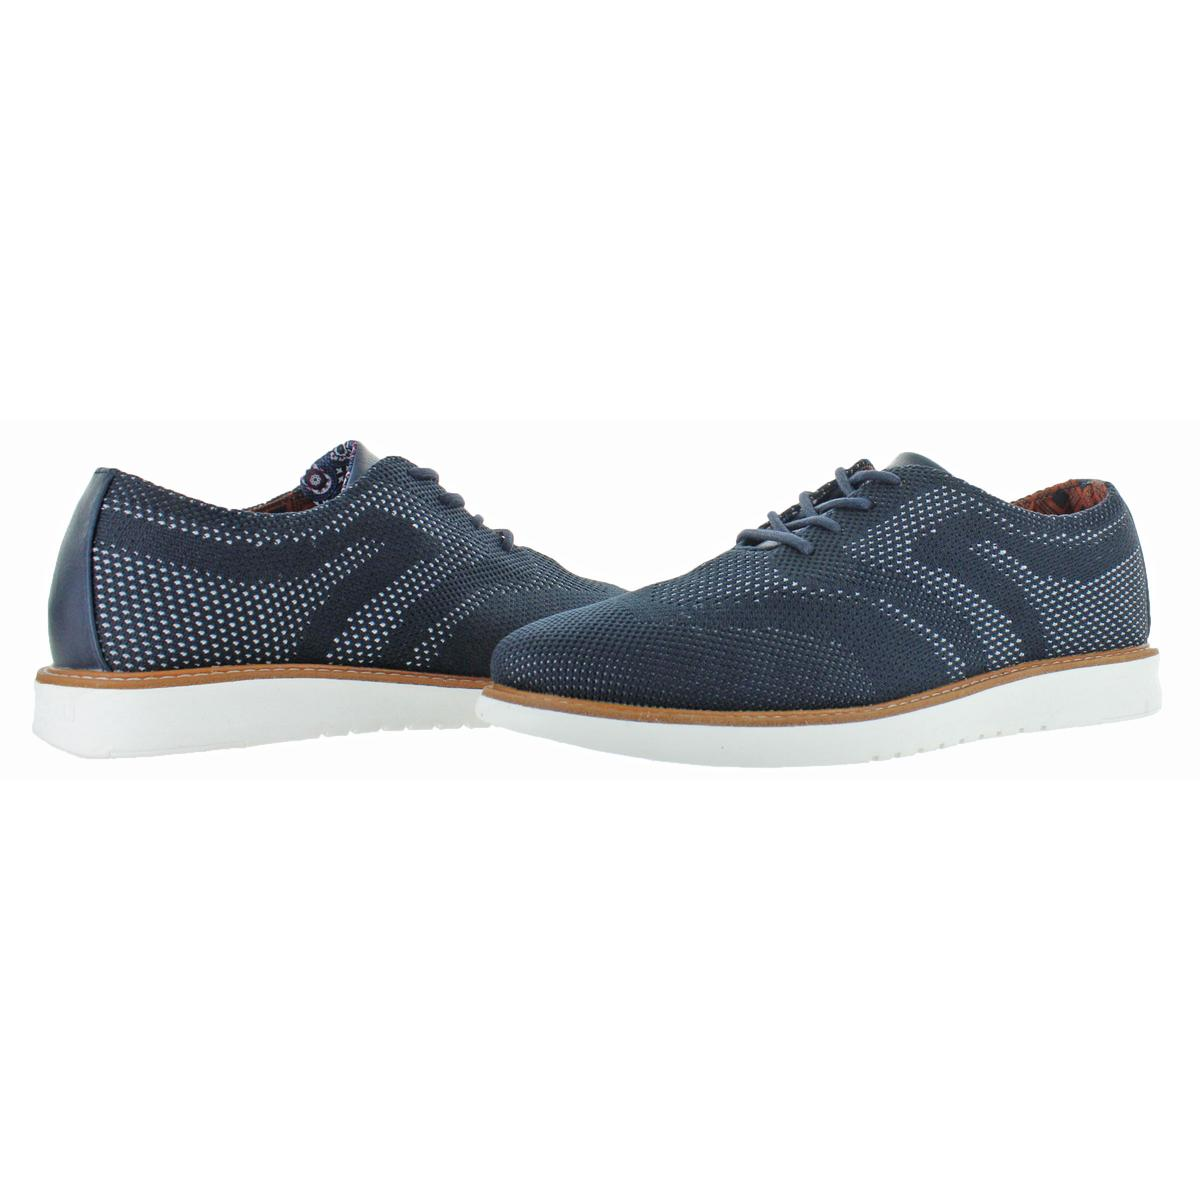 Ben-Sherman-Men-039-s-Omega-Casual-Wingtip-Oxford-Sneakers thumbnail 6